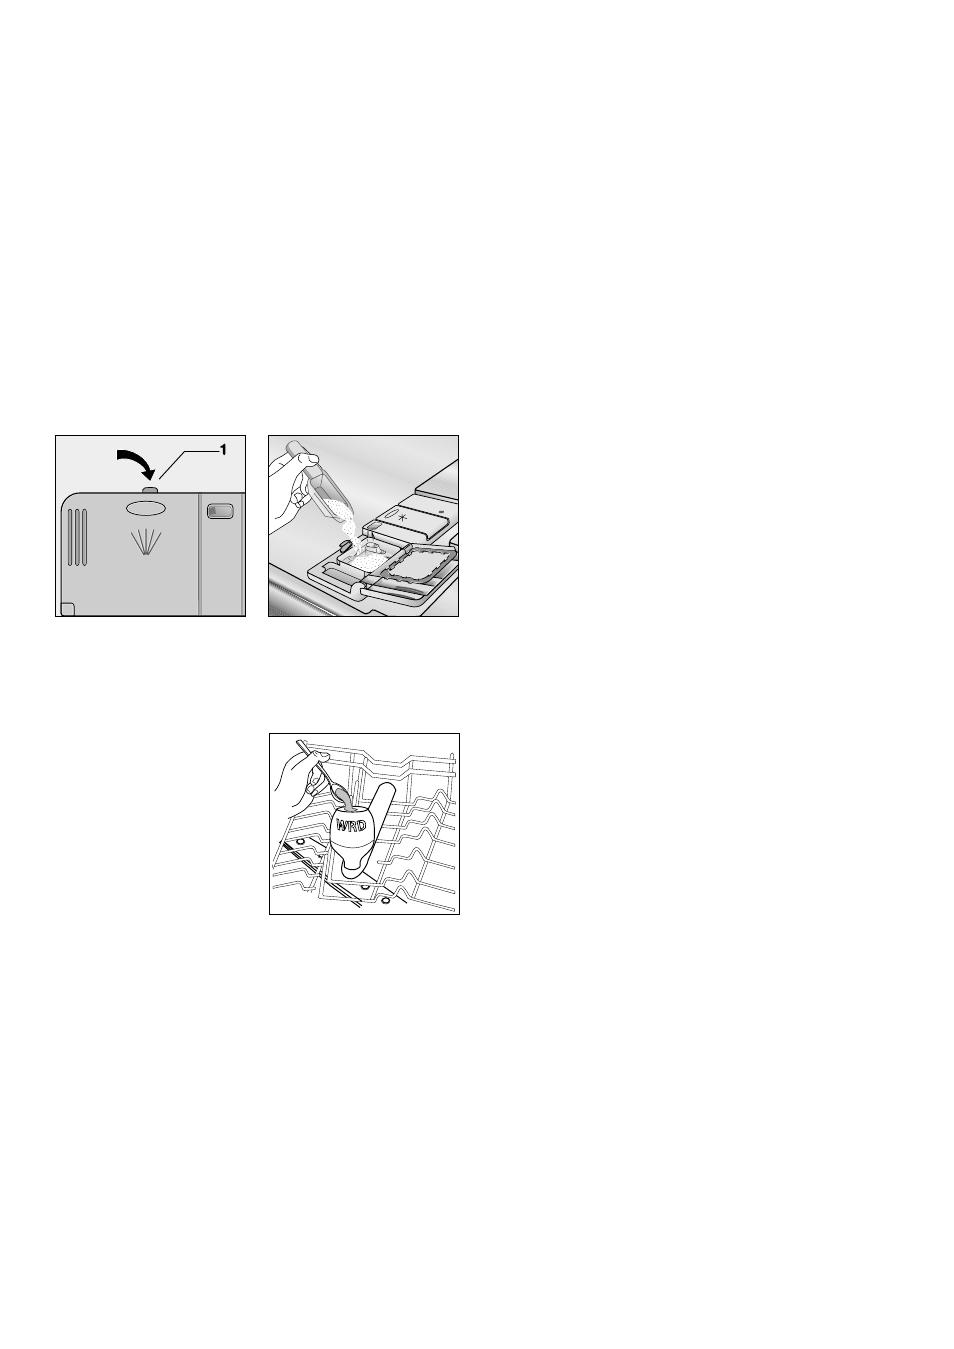 use of detergent fill with detergent zanussi de 6850 user manual rh manualsdir com